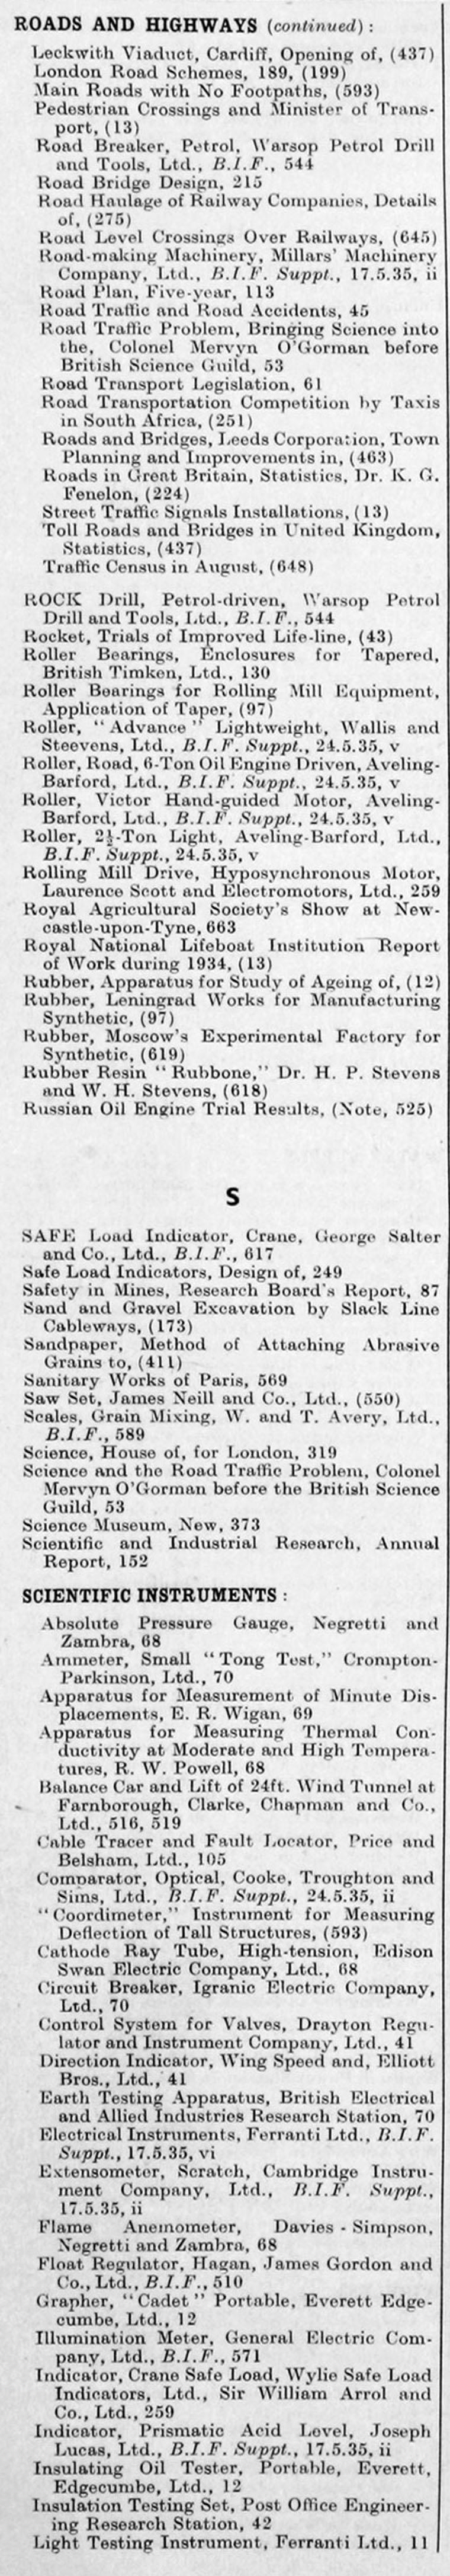 The Engineer 1935 Jan-Jun: Index